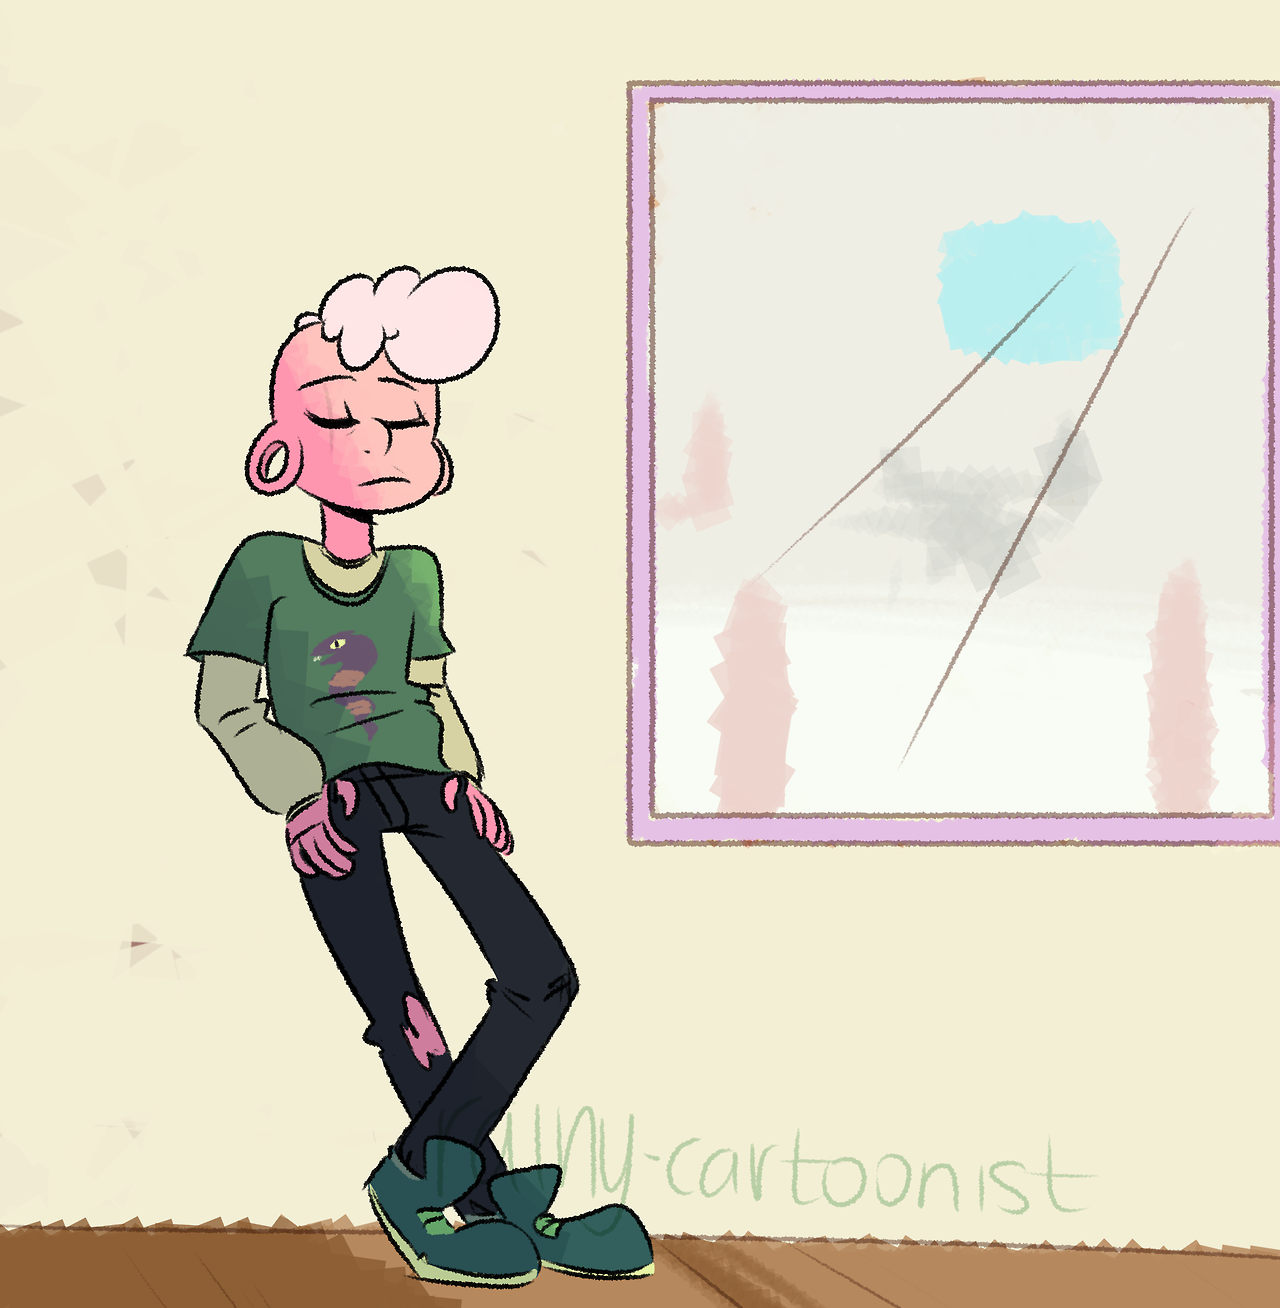 I want Lars to yell and make portals